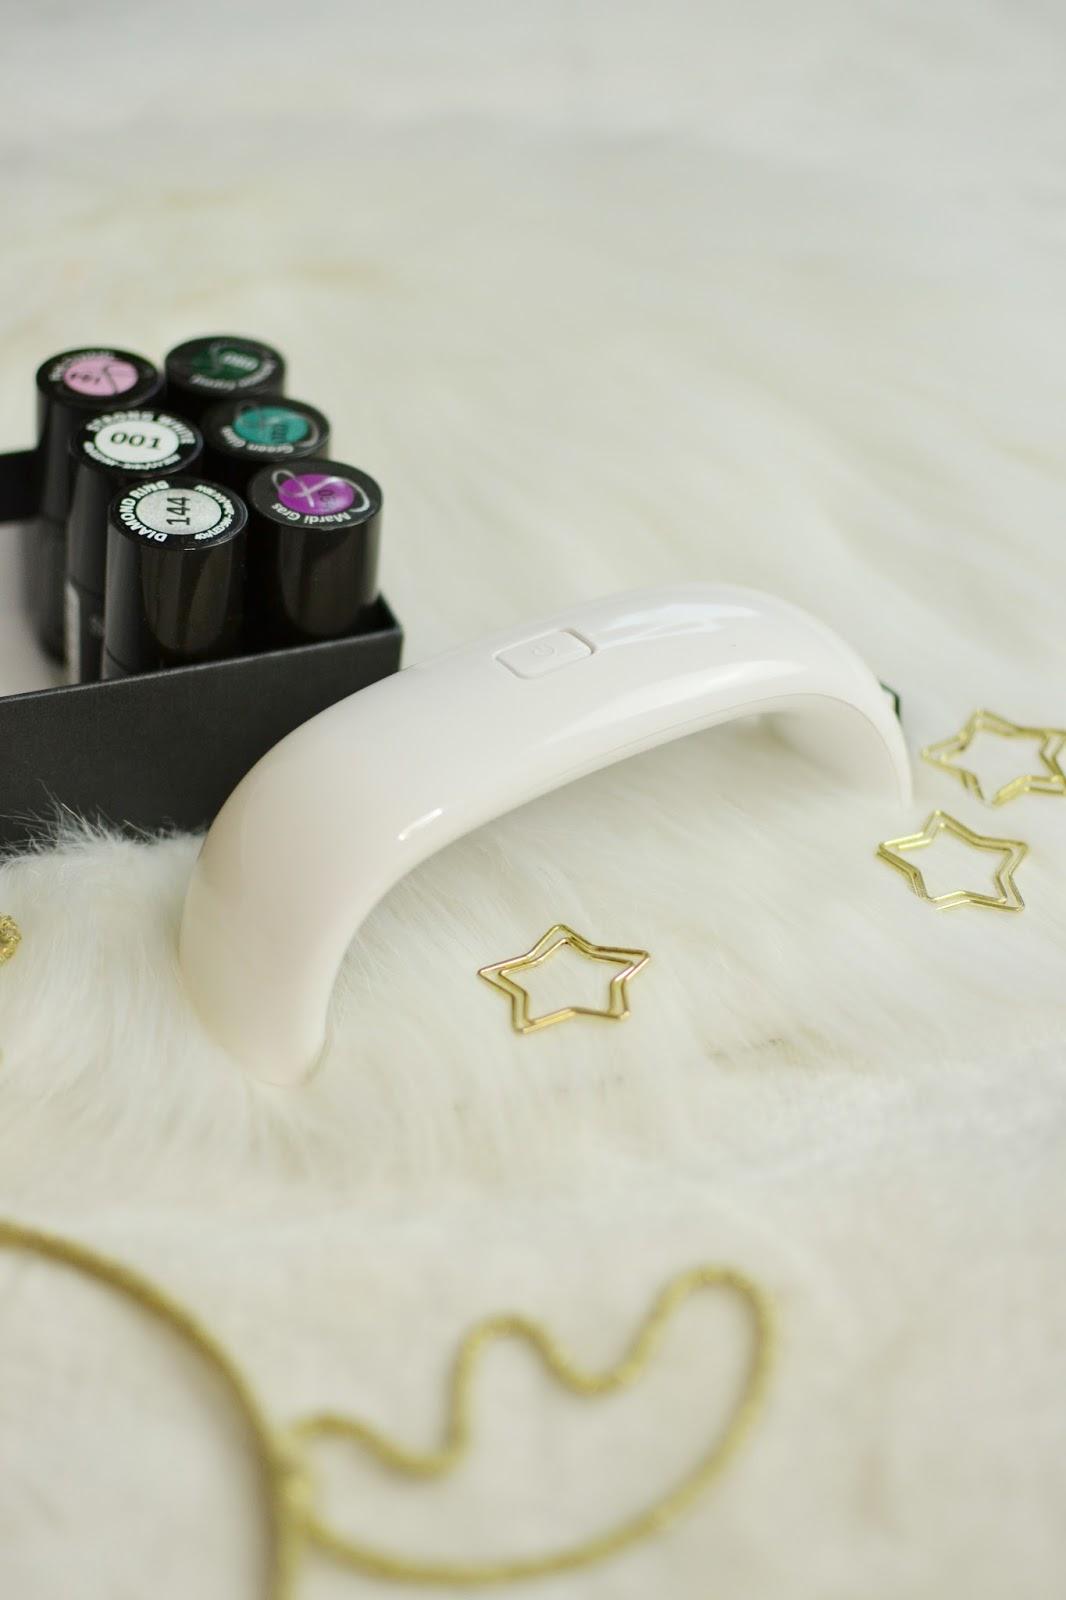 LAMPA LED 9W manicure hybrydowy hybrydy